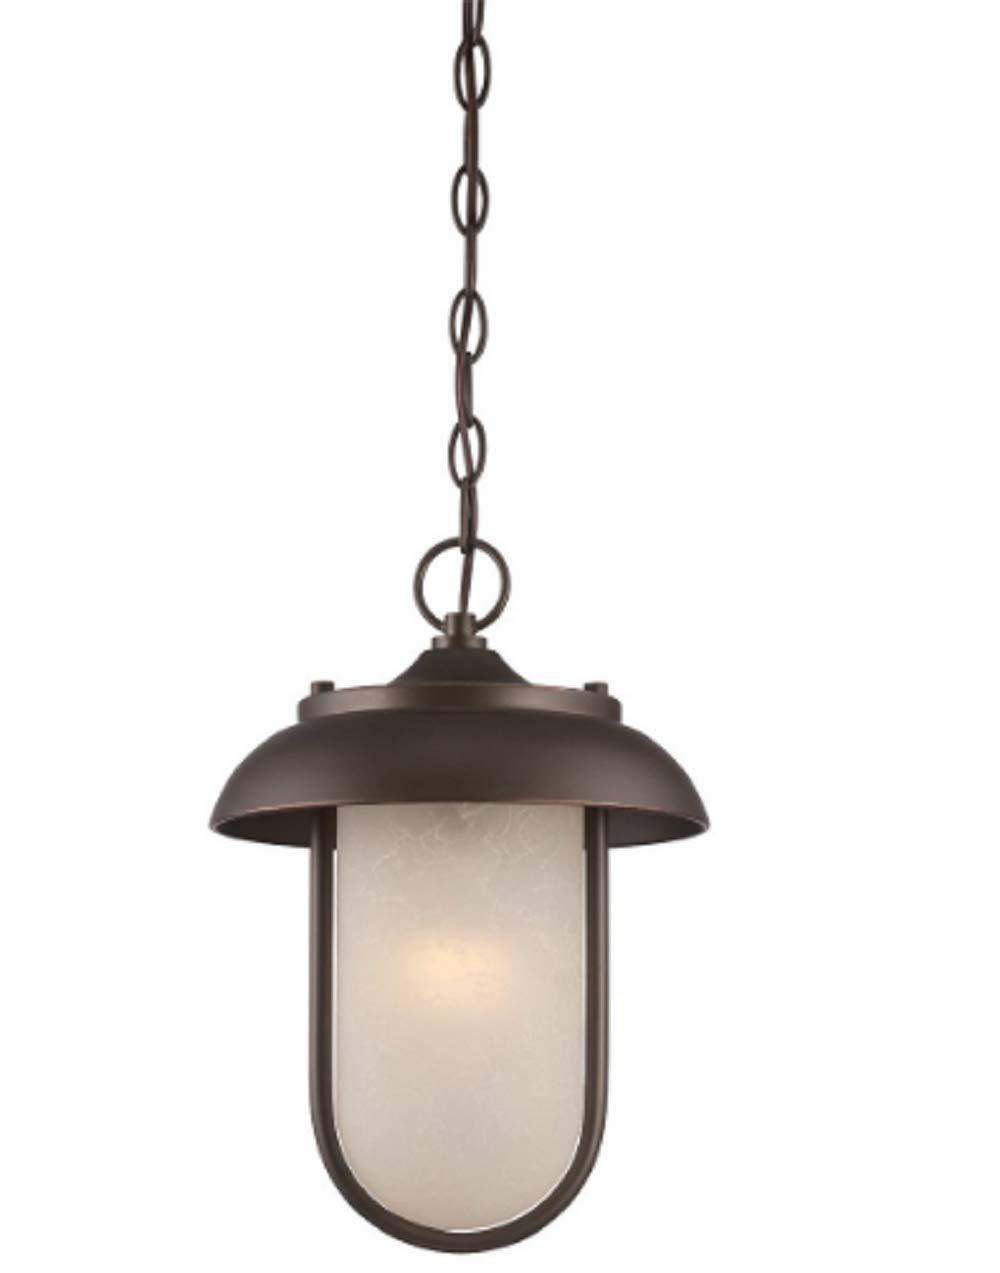 Lighting 62/675 Tulsa LED 10 inch Mahogany Bronze Outdoor Hanging Light Outdoor Led Inch Hanging Light 9 10 635 Bethany 685 645 Diego CHOOSEandBUY